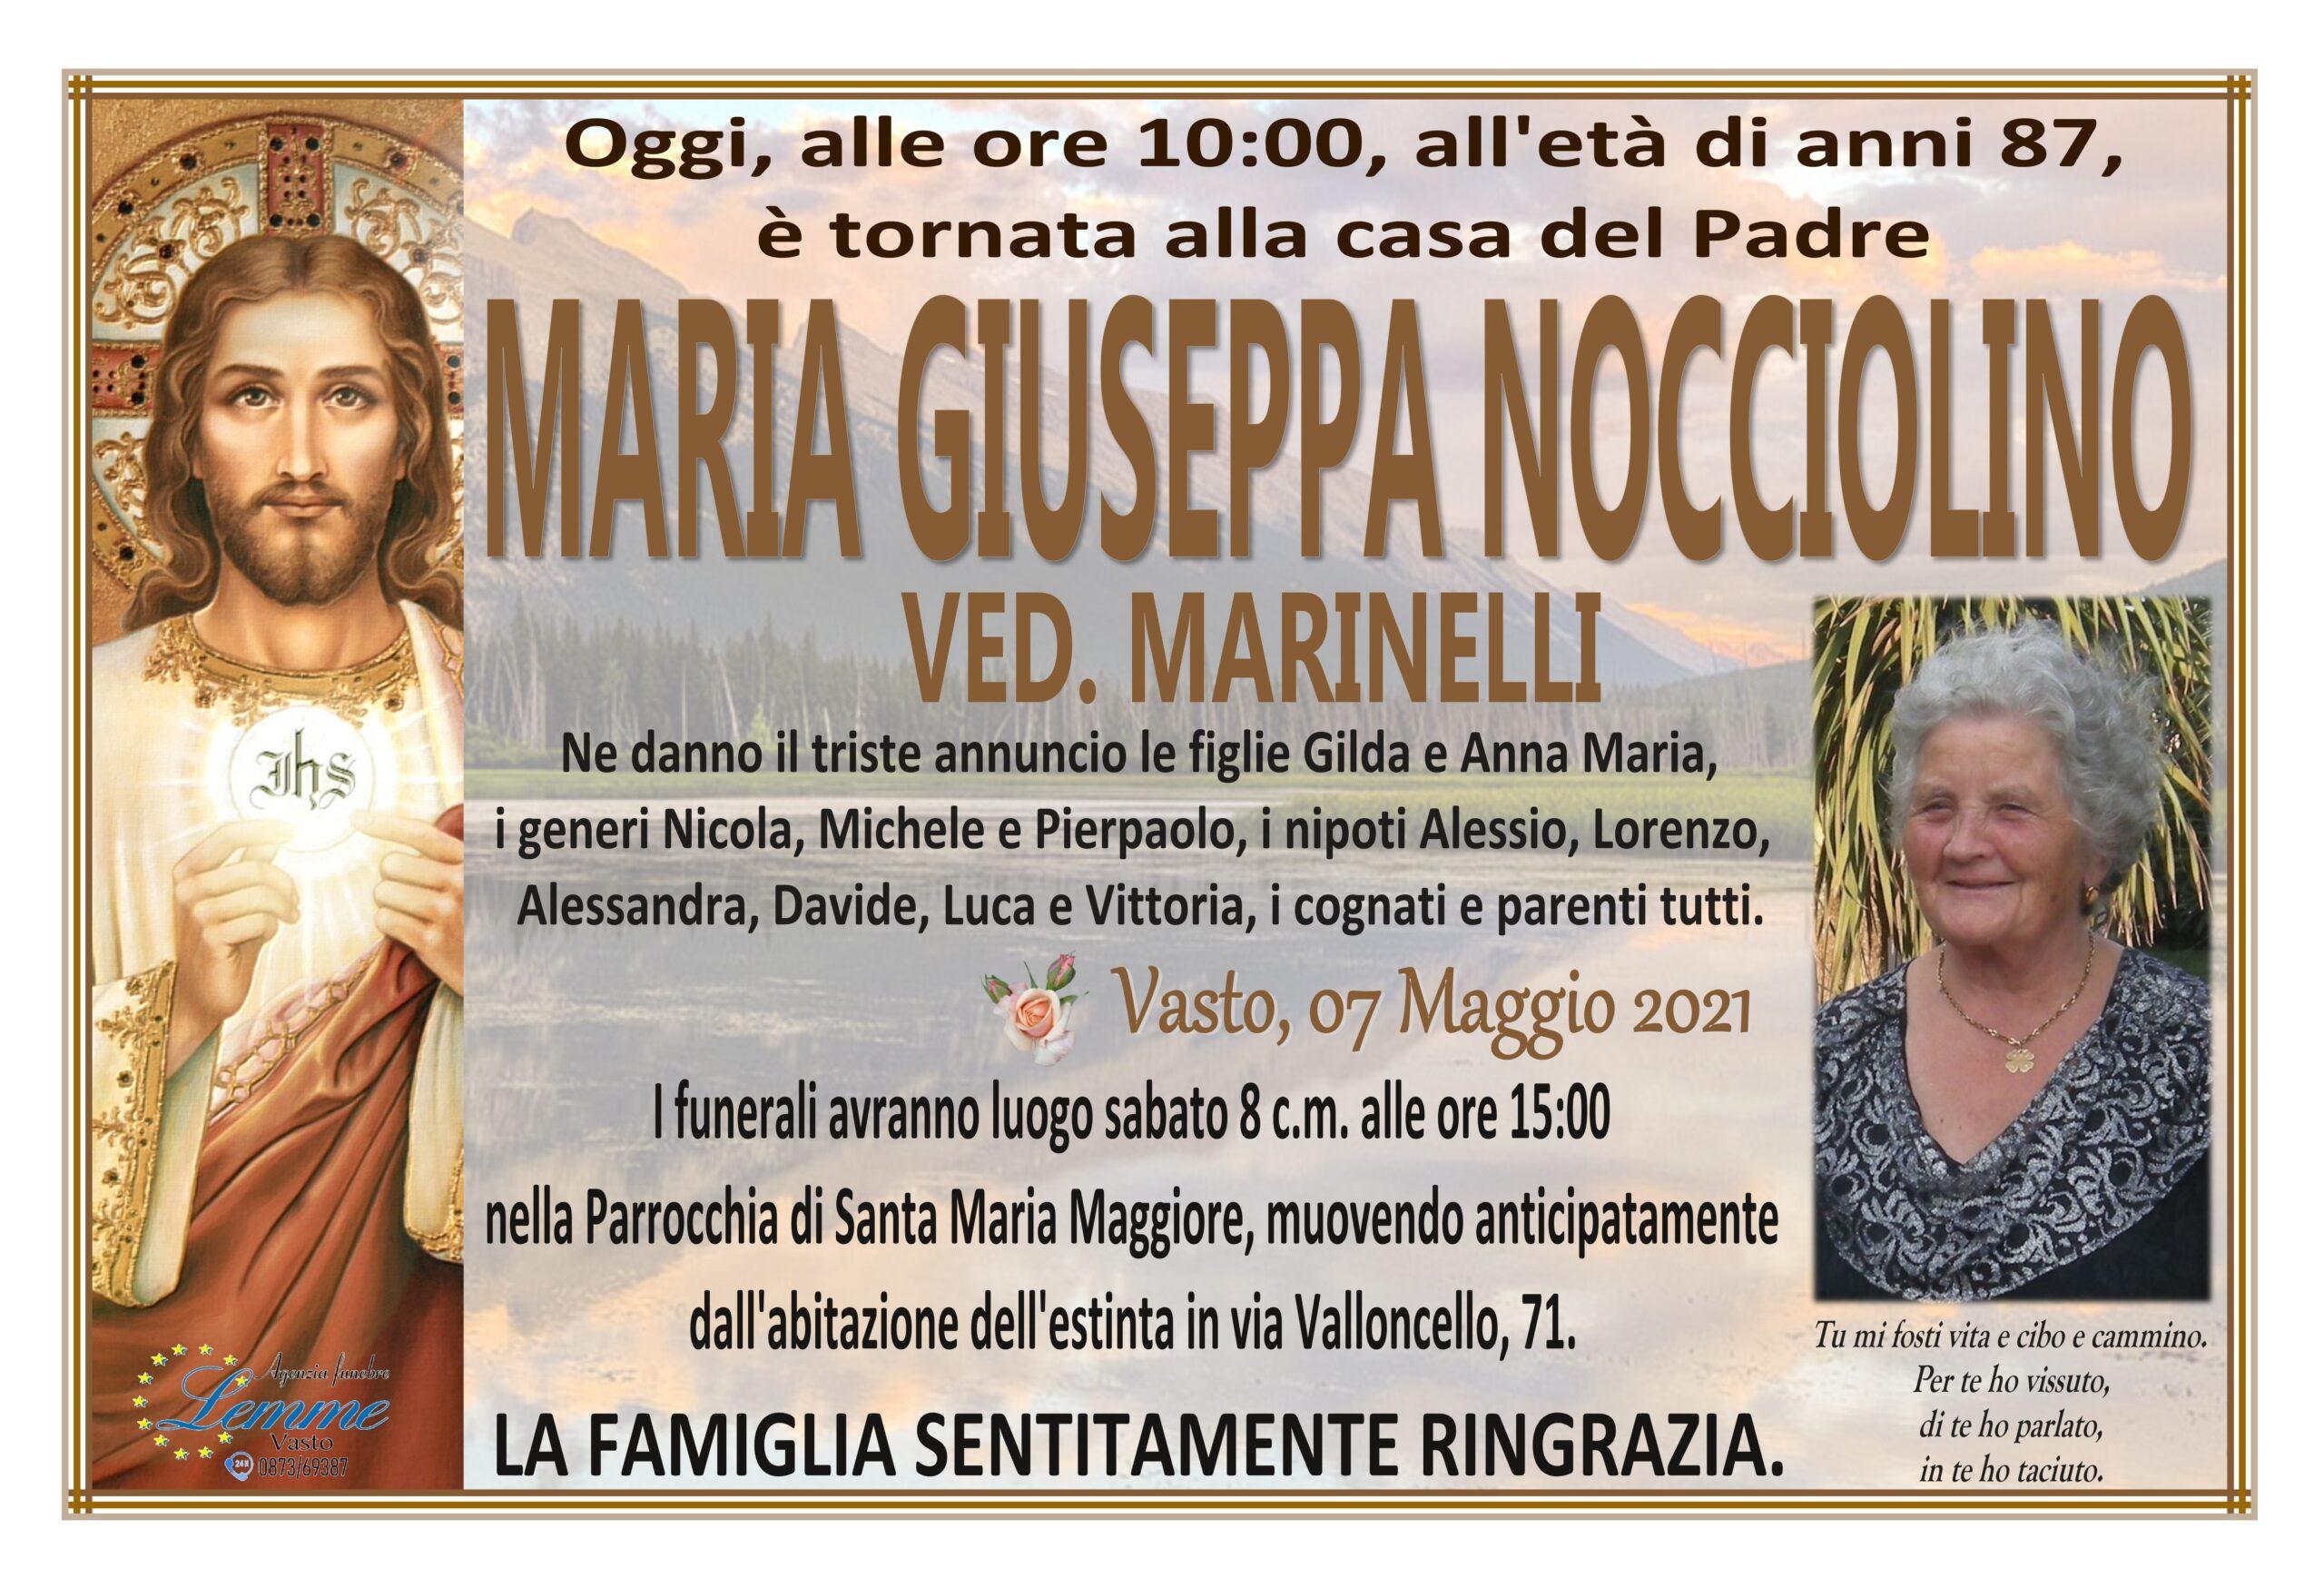 MARIA GIUSEPPA NOCCIOLINO